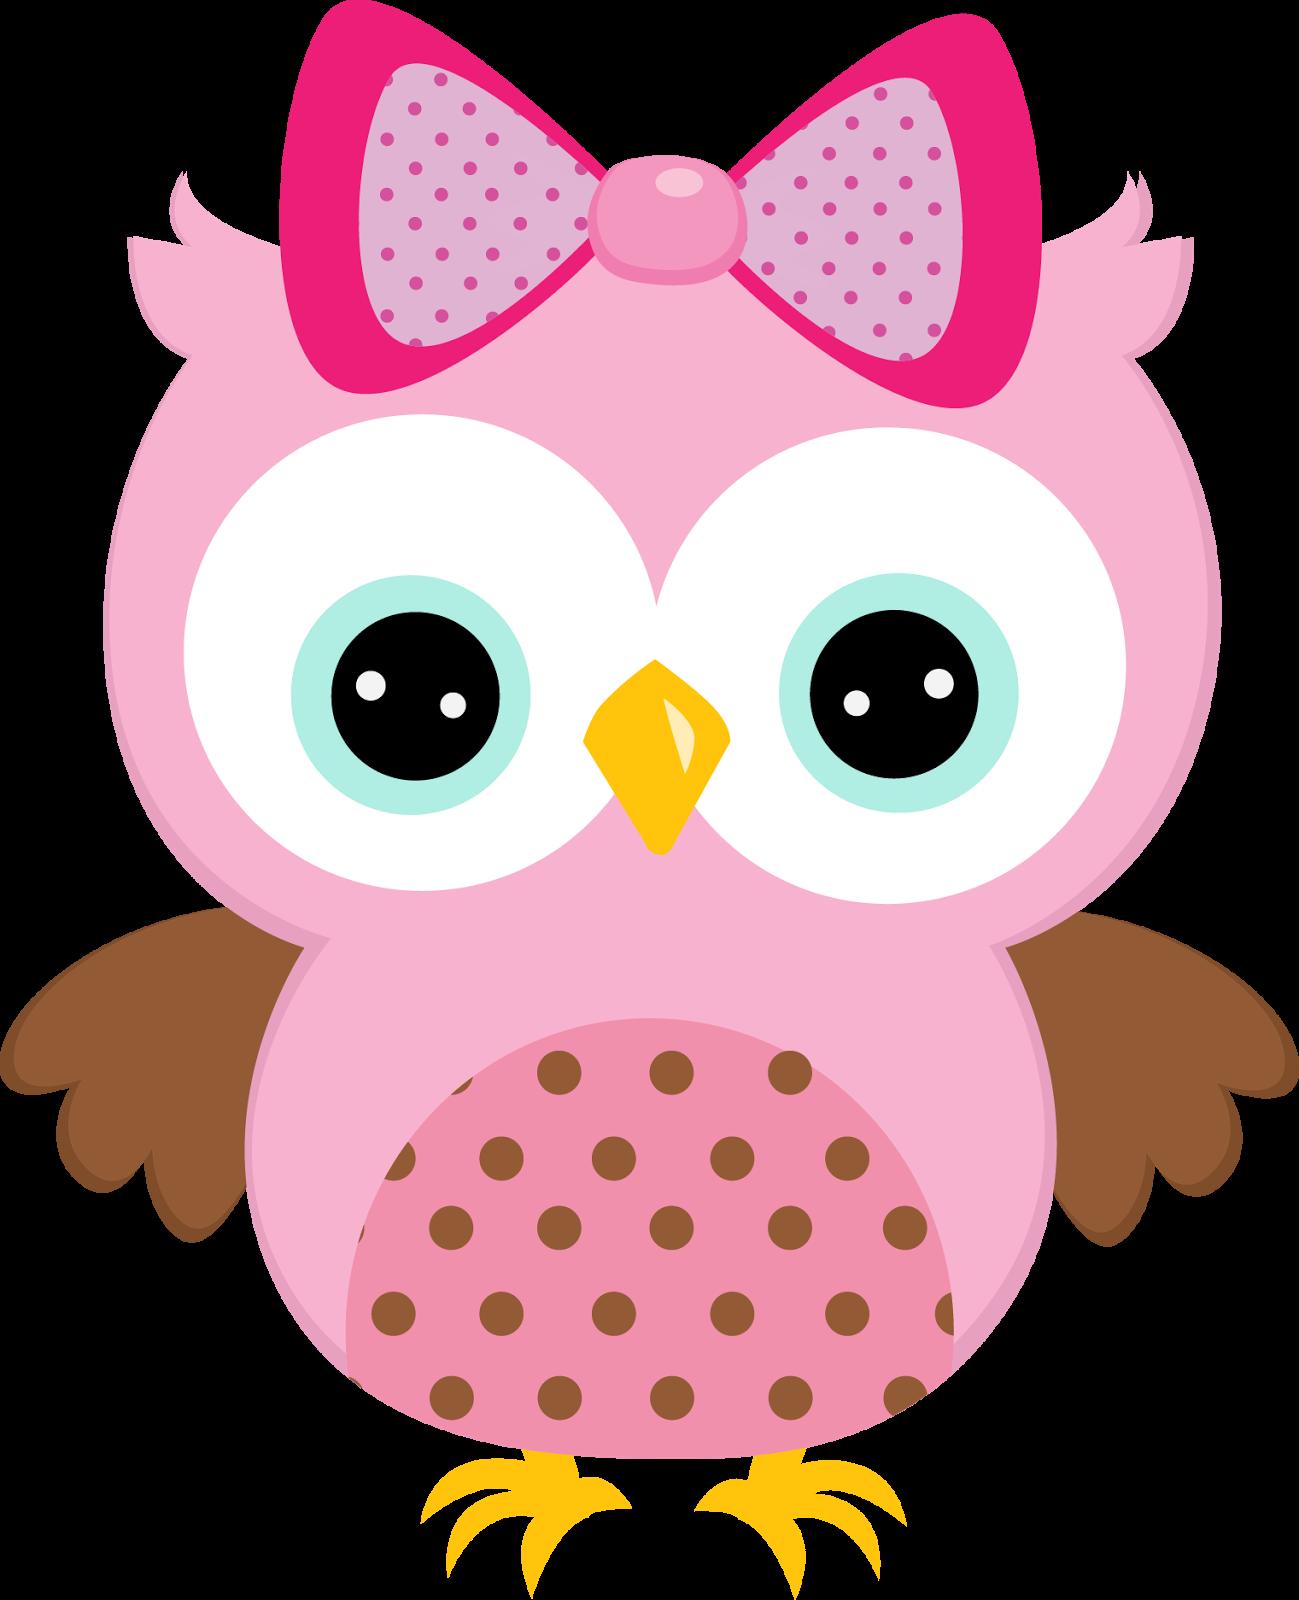 Cute owl clip art png - photo#9